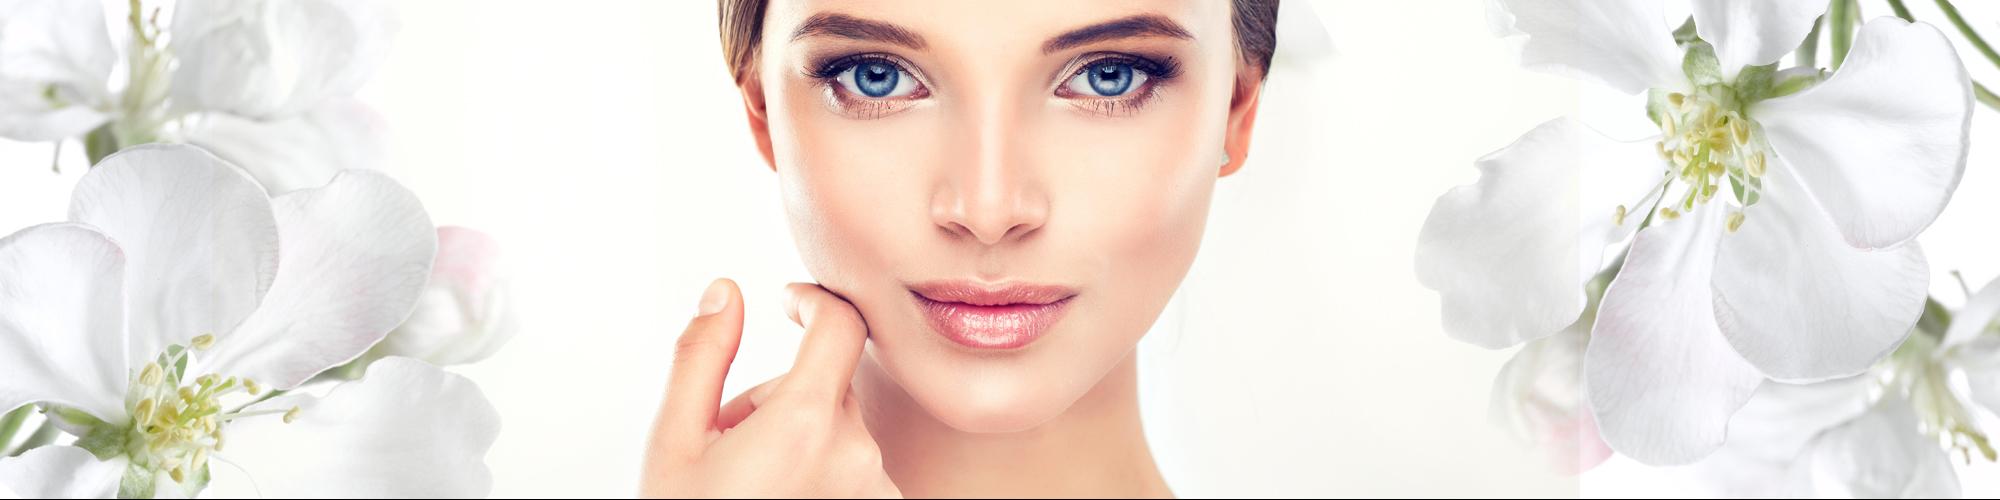 Laser Skin Resurfacing in Pasadena, CA | Certified Allergan Trainers